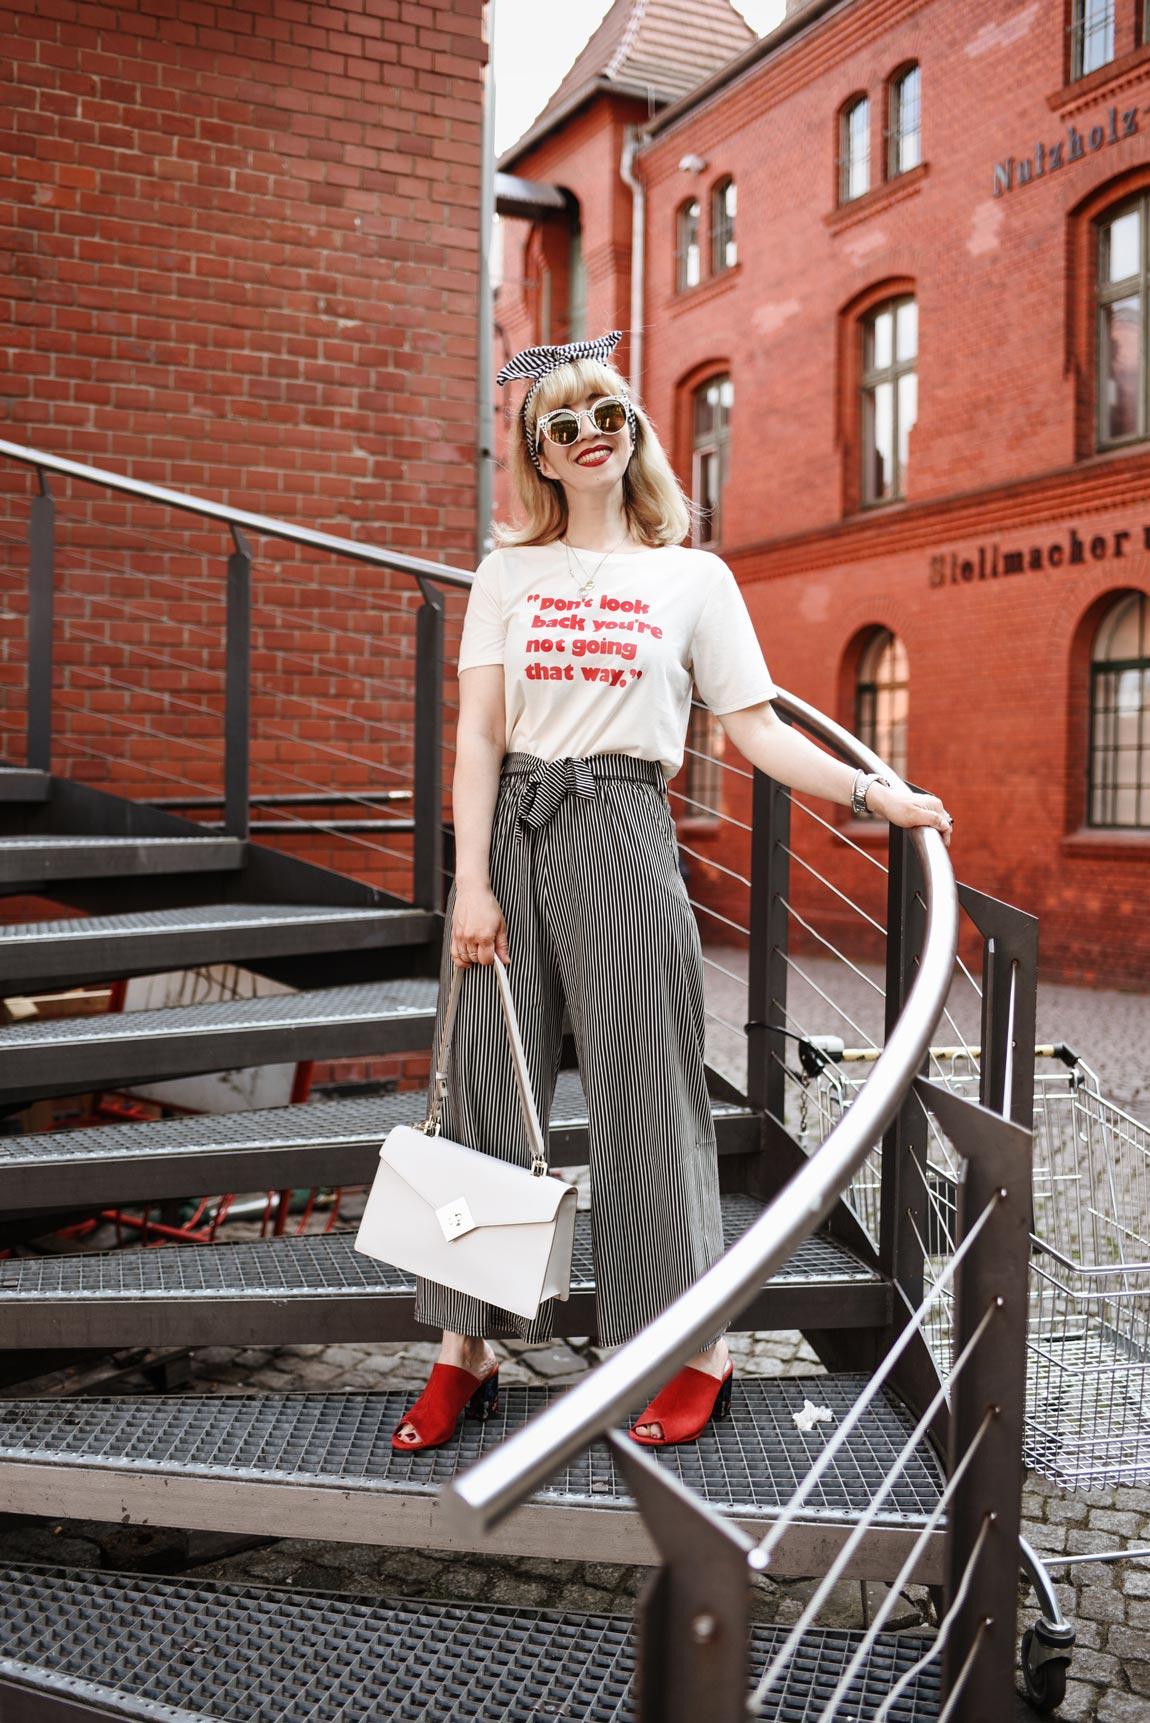 streifen, culotte, sommer, summer, berlin, fashionblog, modeblog, outfit, inspiration, ootd, look, streetstyle, fashionista, tipps, kleidung, kombinieren